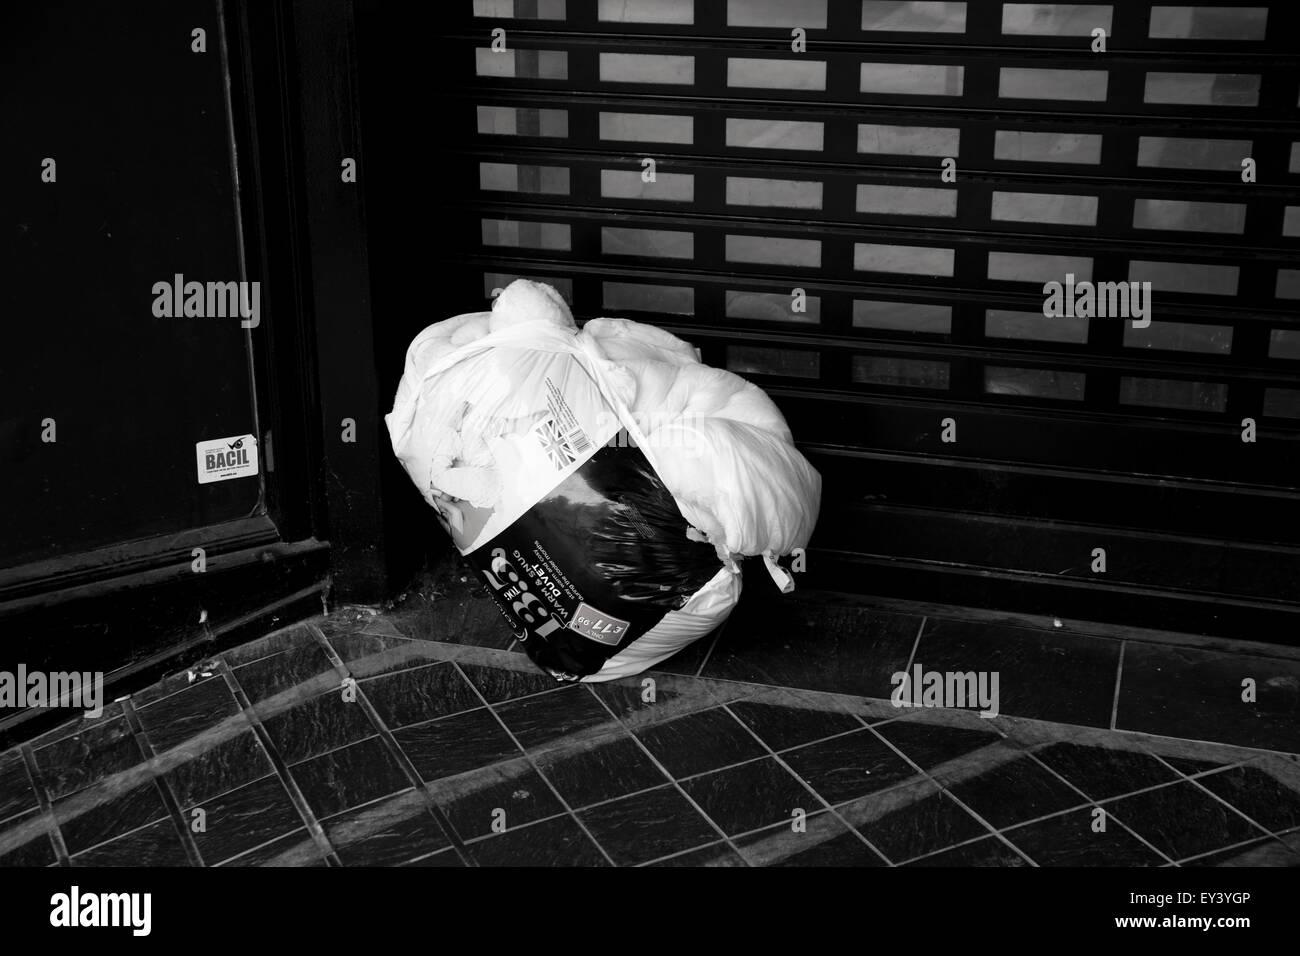 Homeless person's duvet left in a doorway - Stock Image